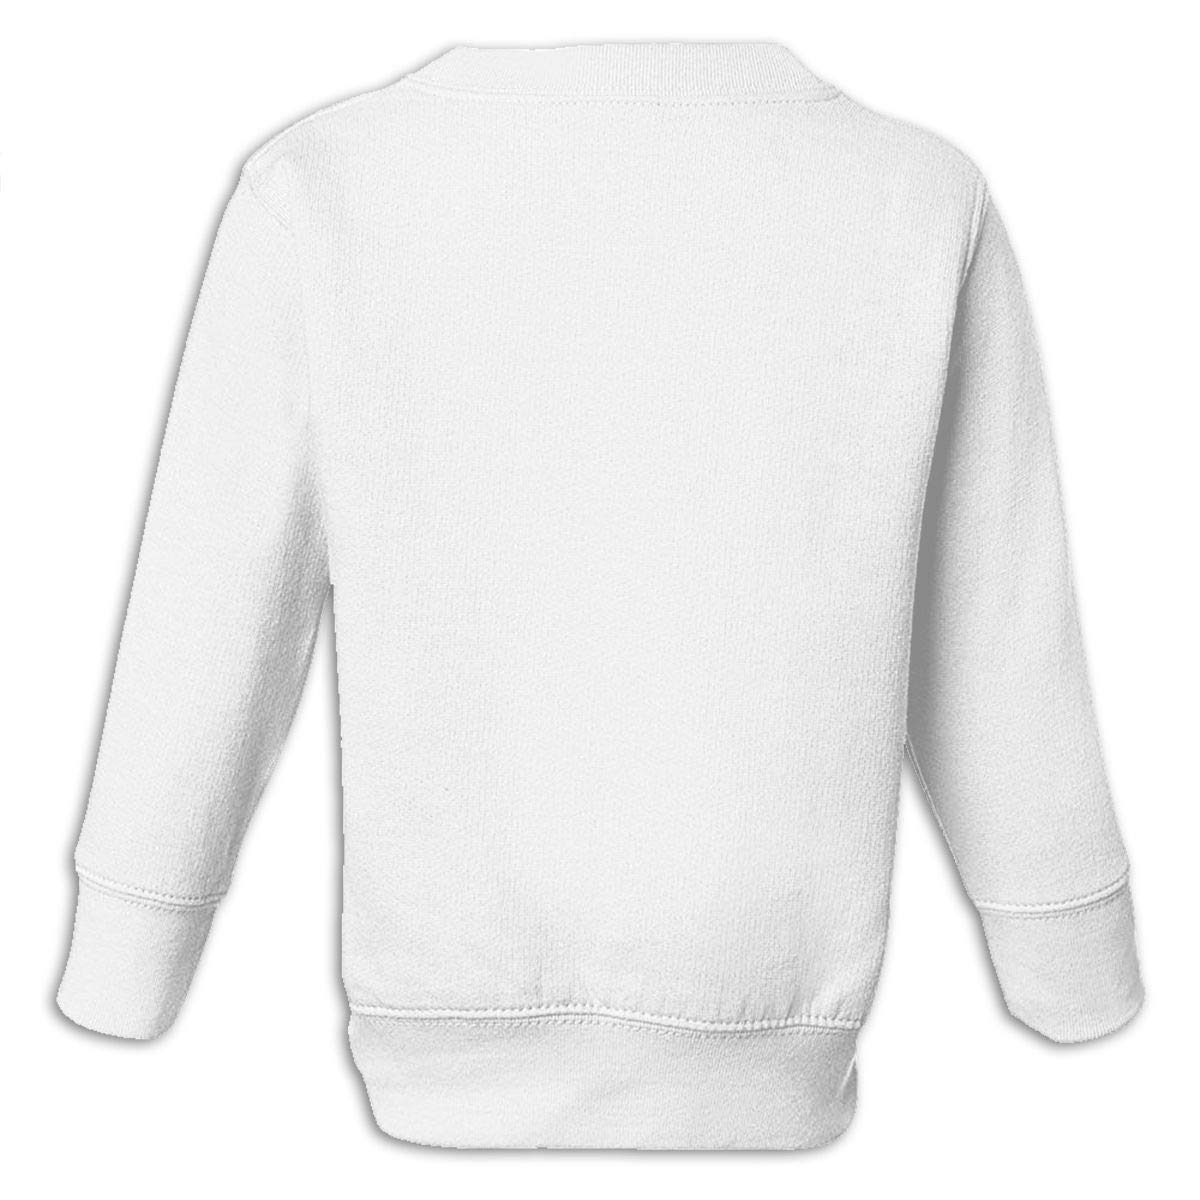 Stylish Shop D D Full Color Kids Boys Toddler Juvenile Sweatshirt